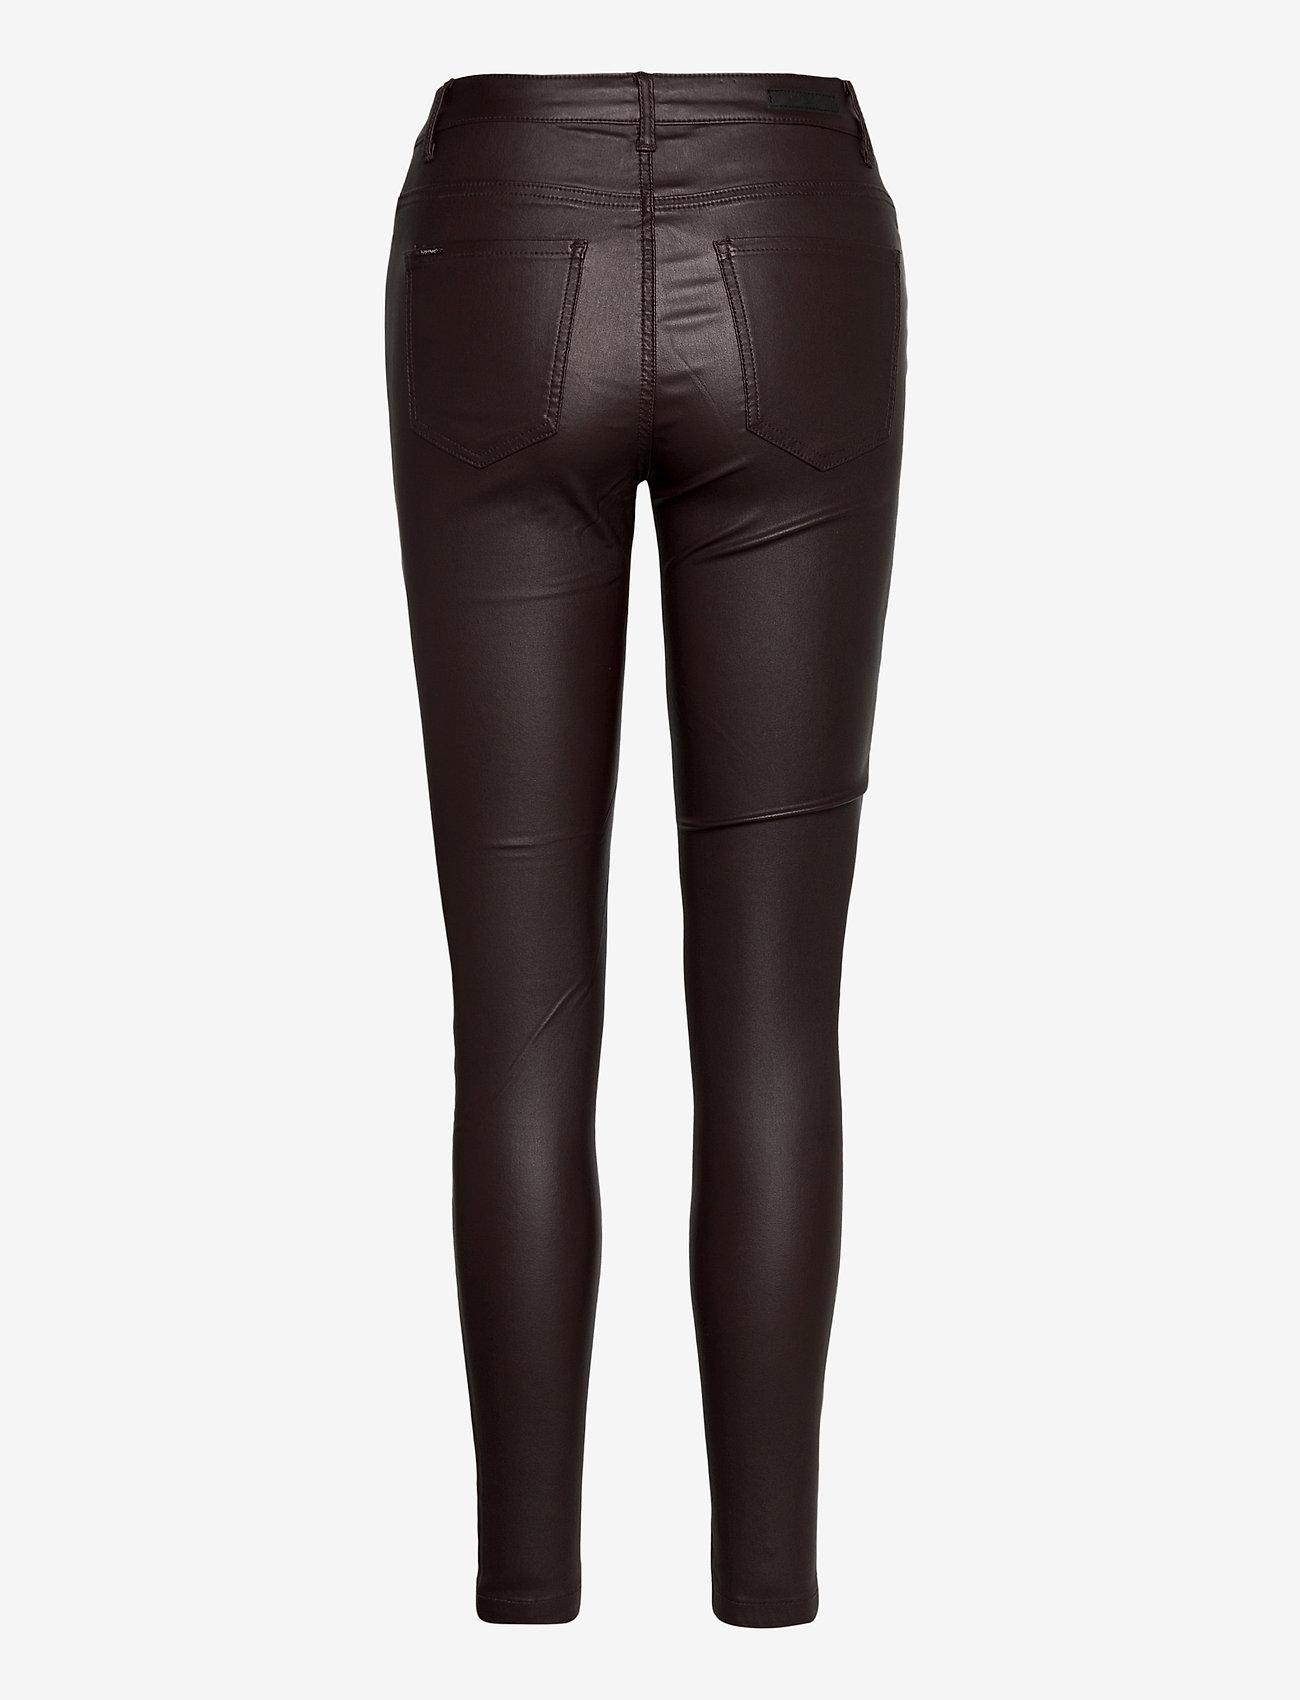 b.young - BYLOLA BYKIKO DECO ZIP - - trousers with skinny legs - chicory coffee - 1